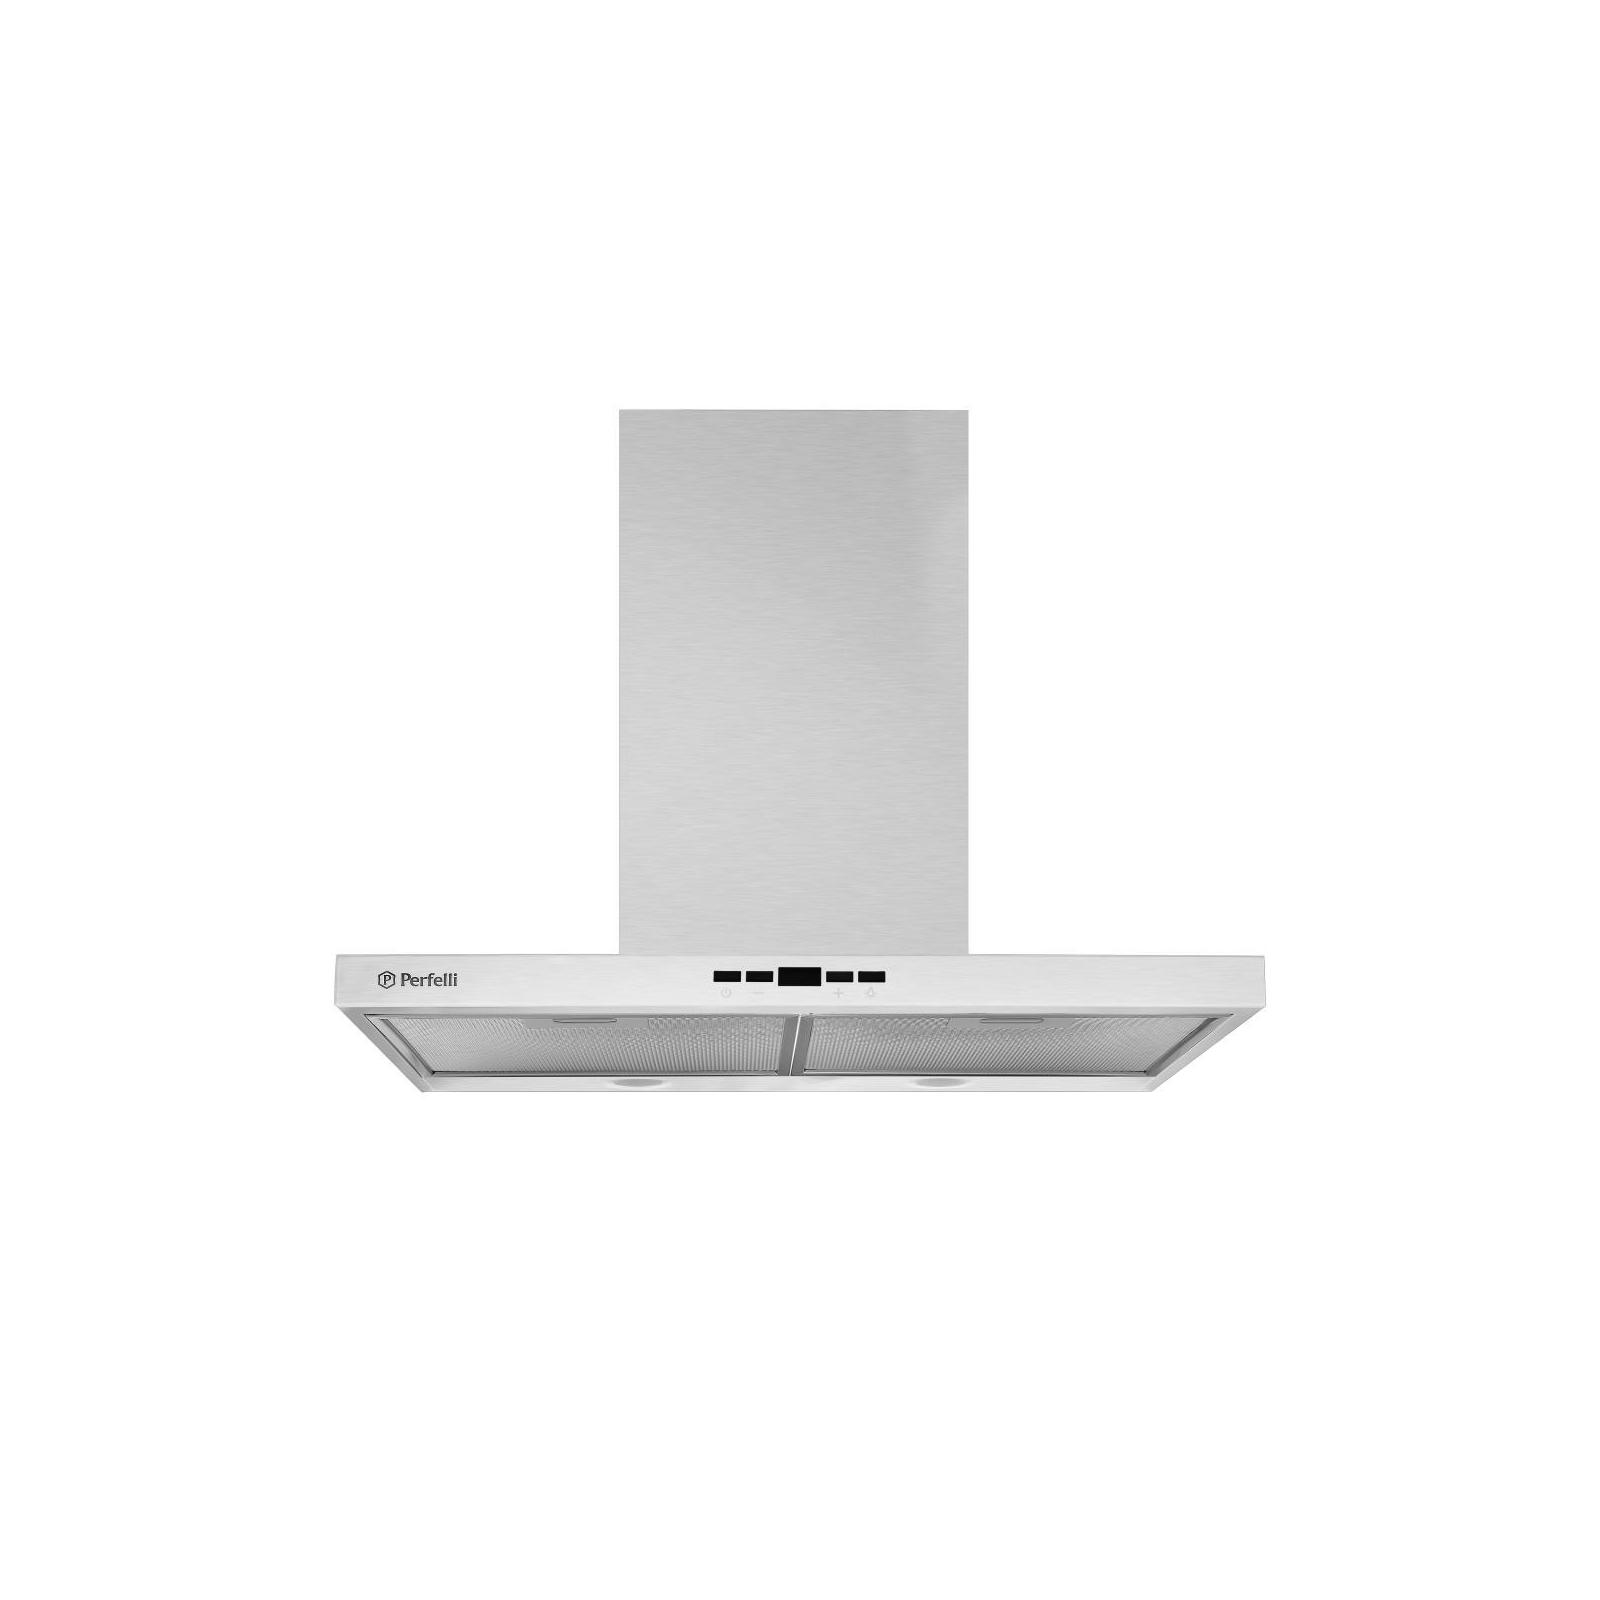 Вытяжка кухонная PERFELLI TET 6612 A 1000 I LED